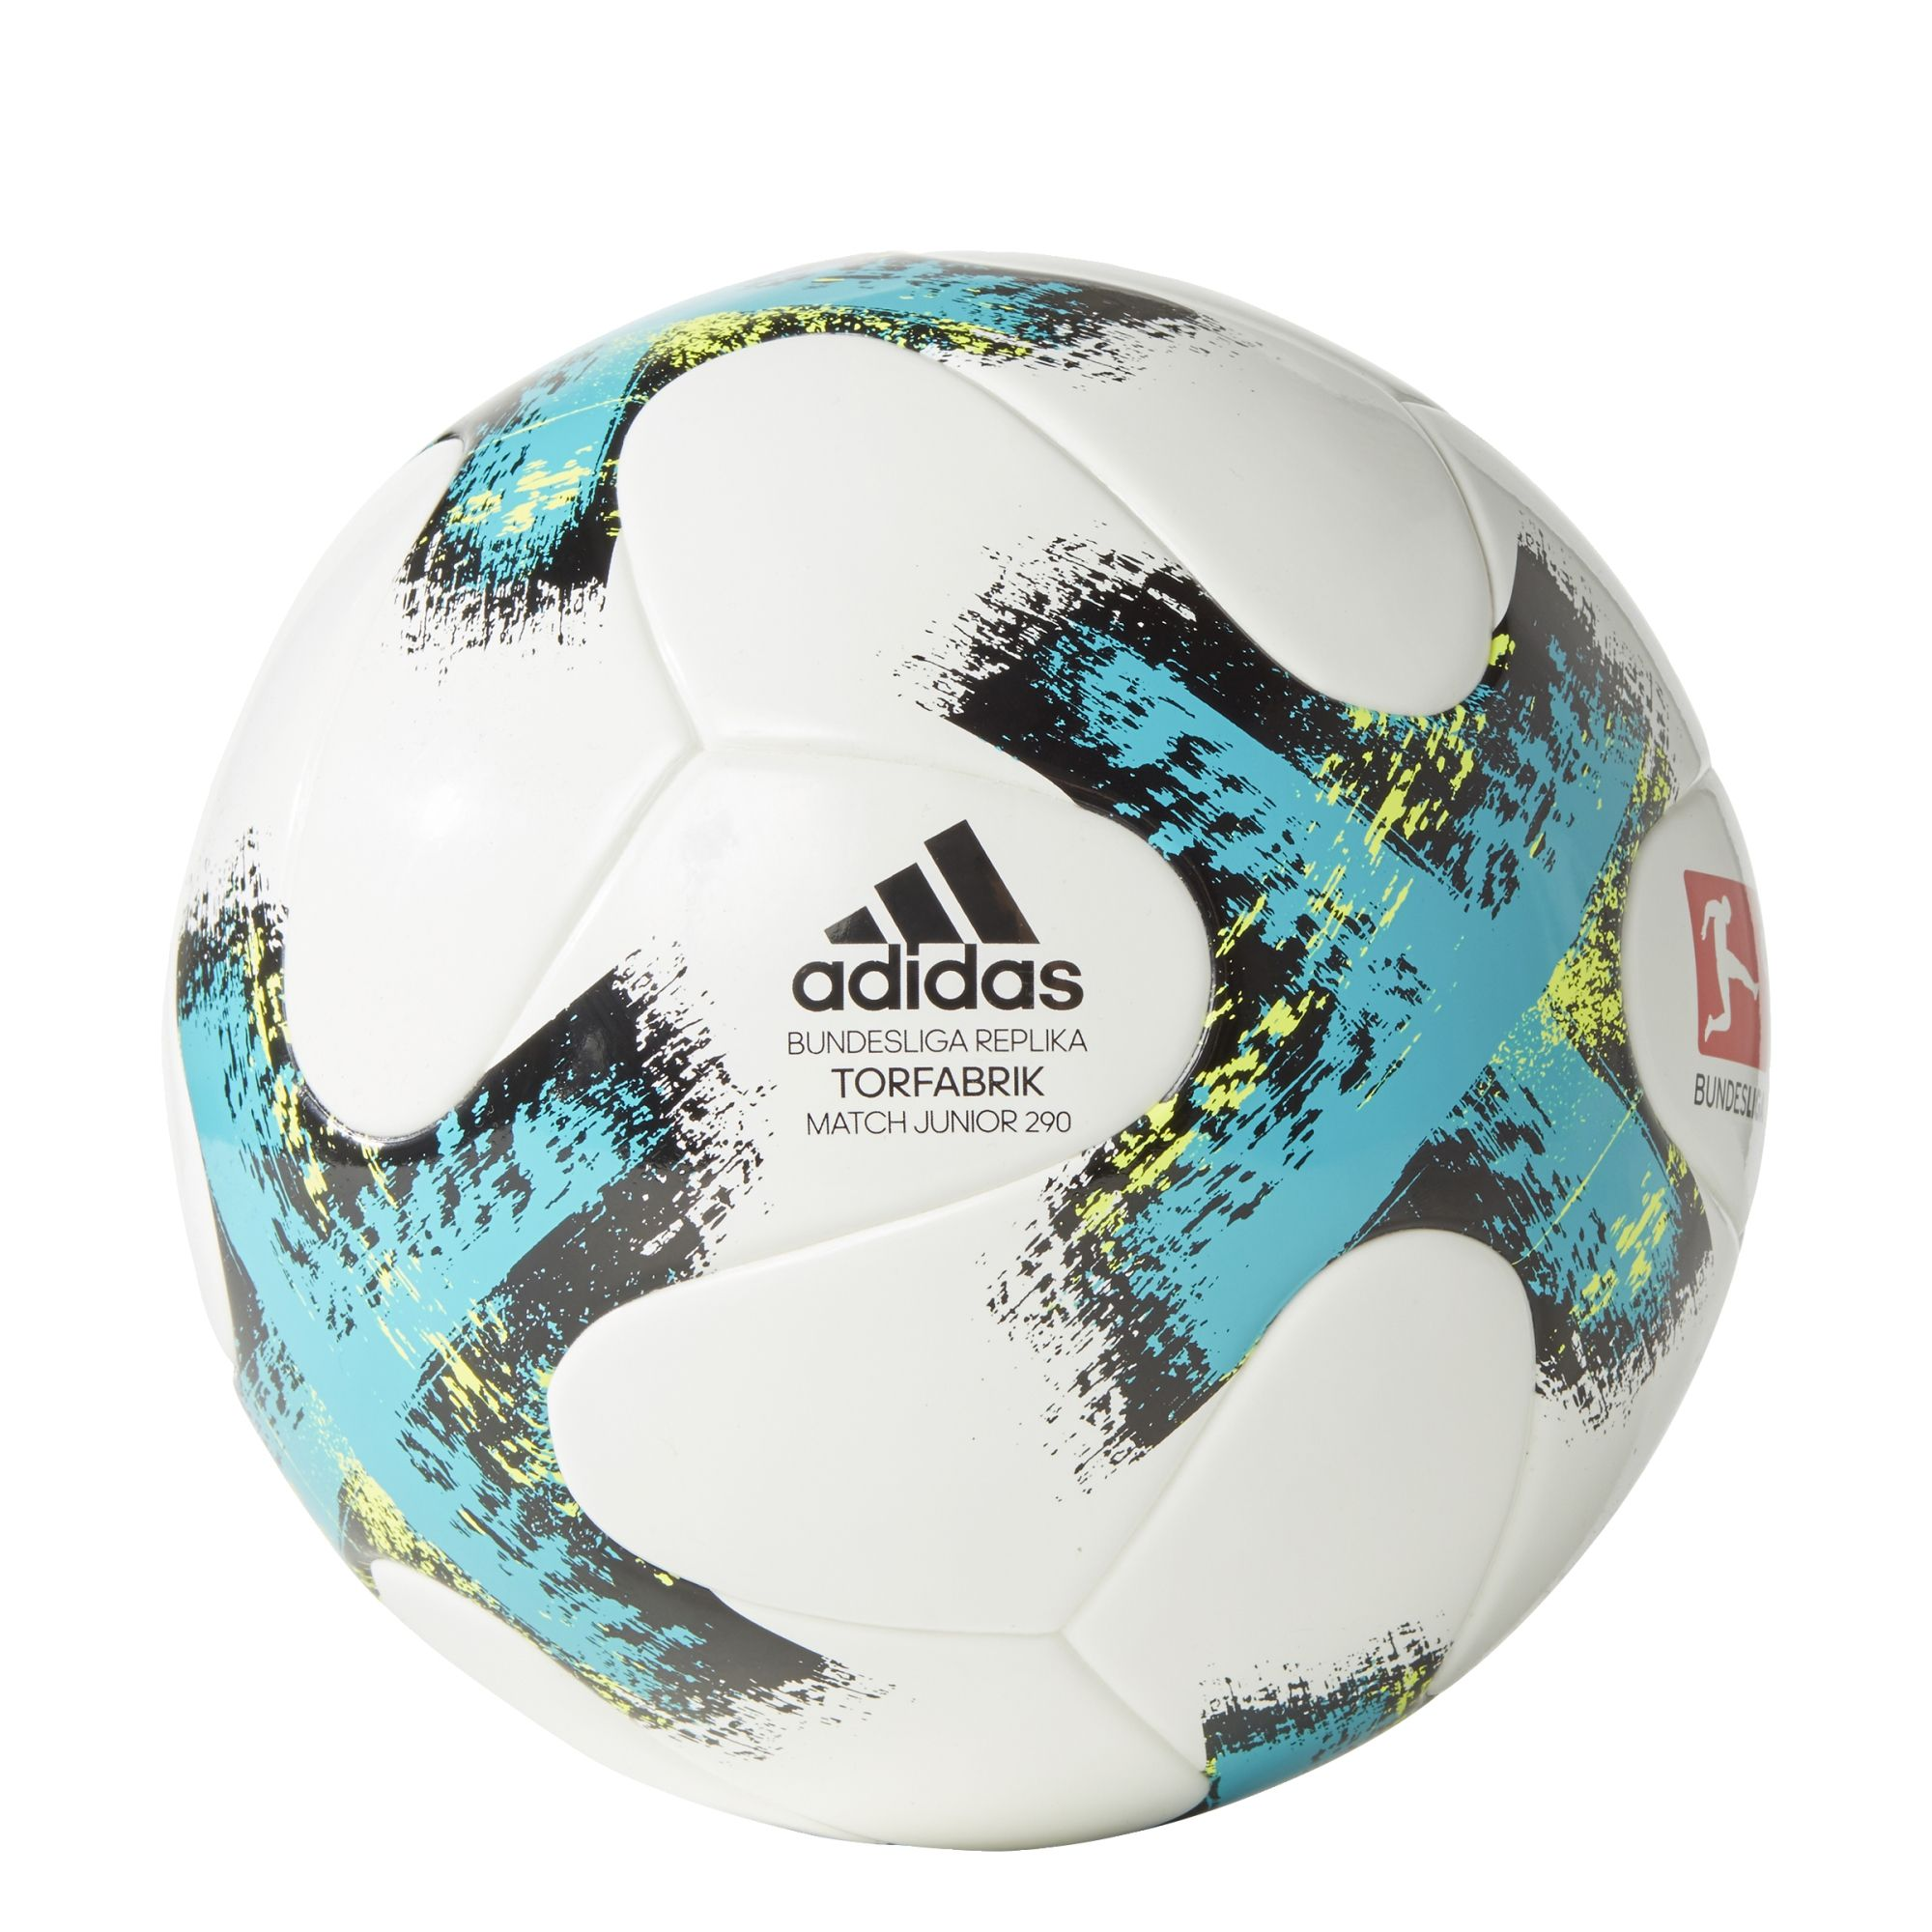 ADIDAS PERFORMANCE adidas Performance Fußball »Torfabrik Junior 290 17/18«